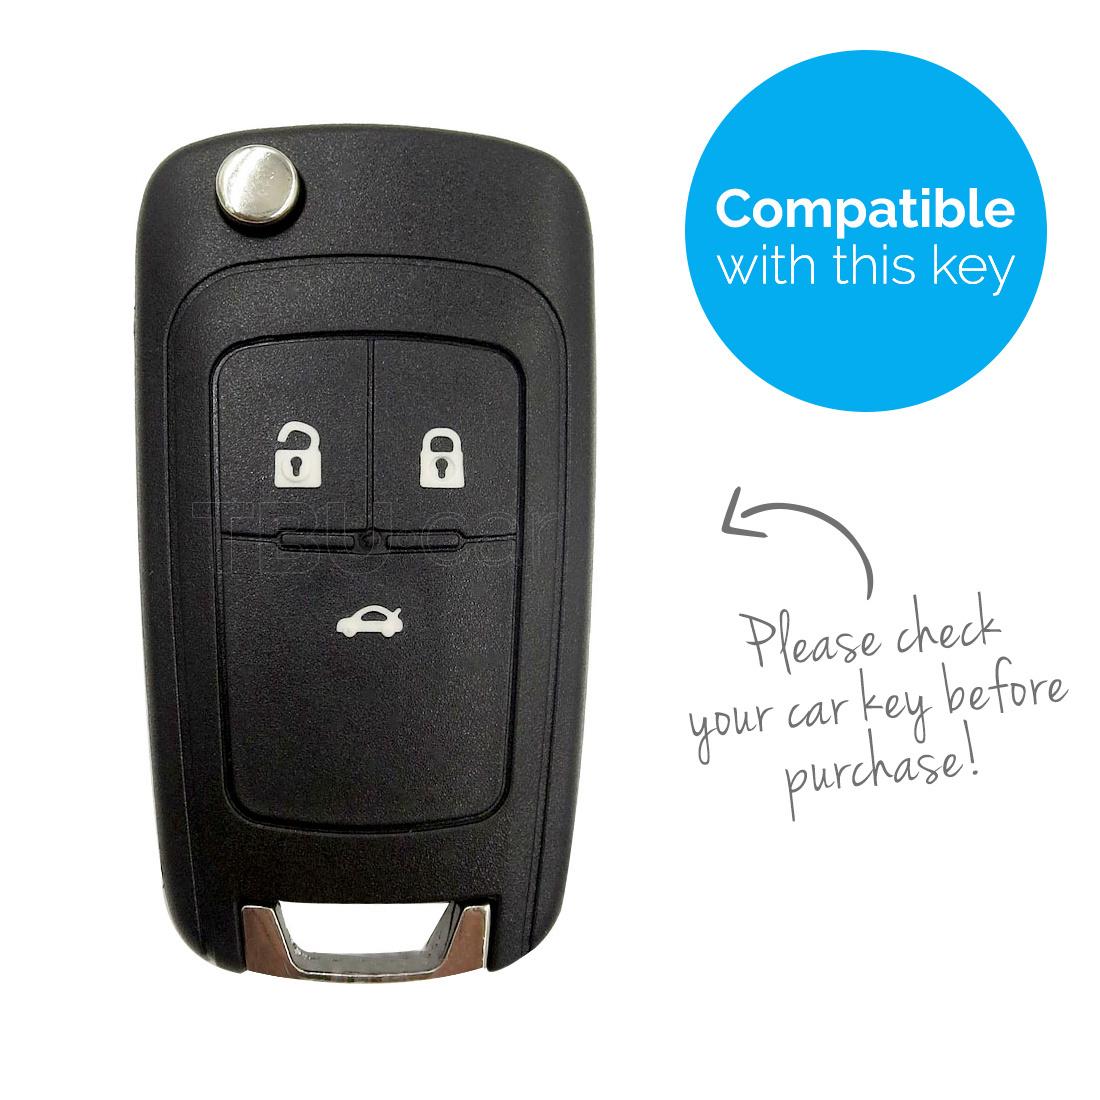 TBU car Autoschlüssel Hülle für Vauxhall 3 Tasten - Schutzhülle aus Silikon - Auto Schlüsselhülle Cover in Hellblau